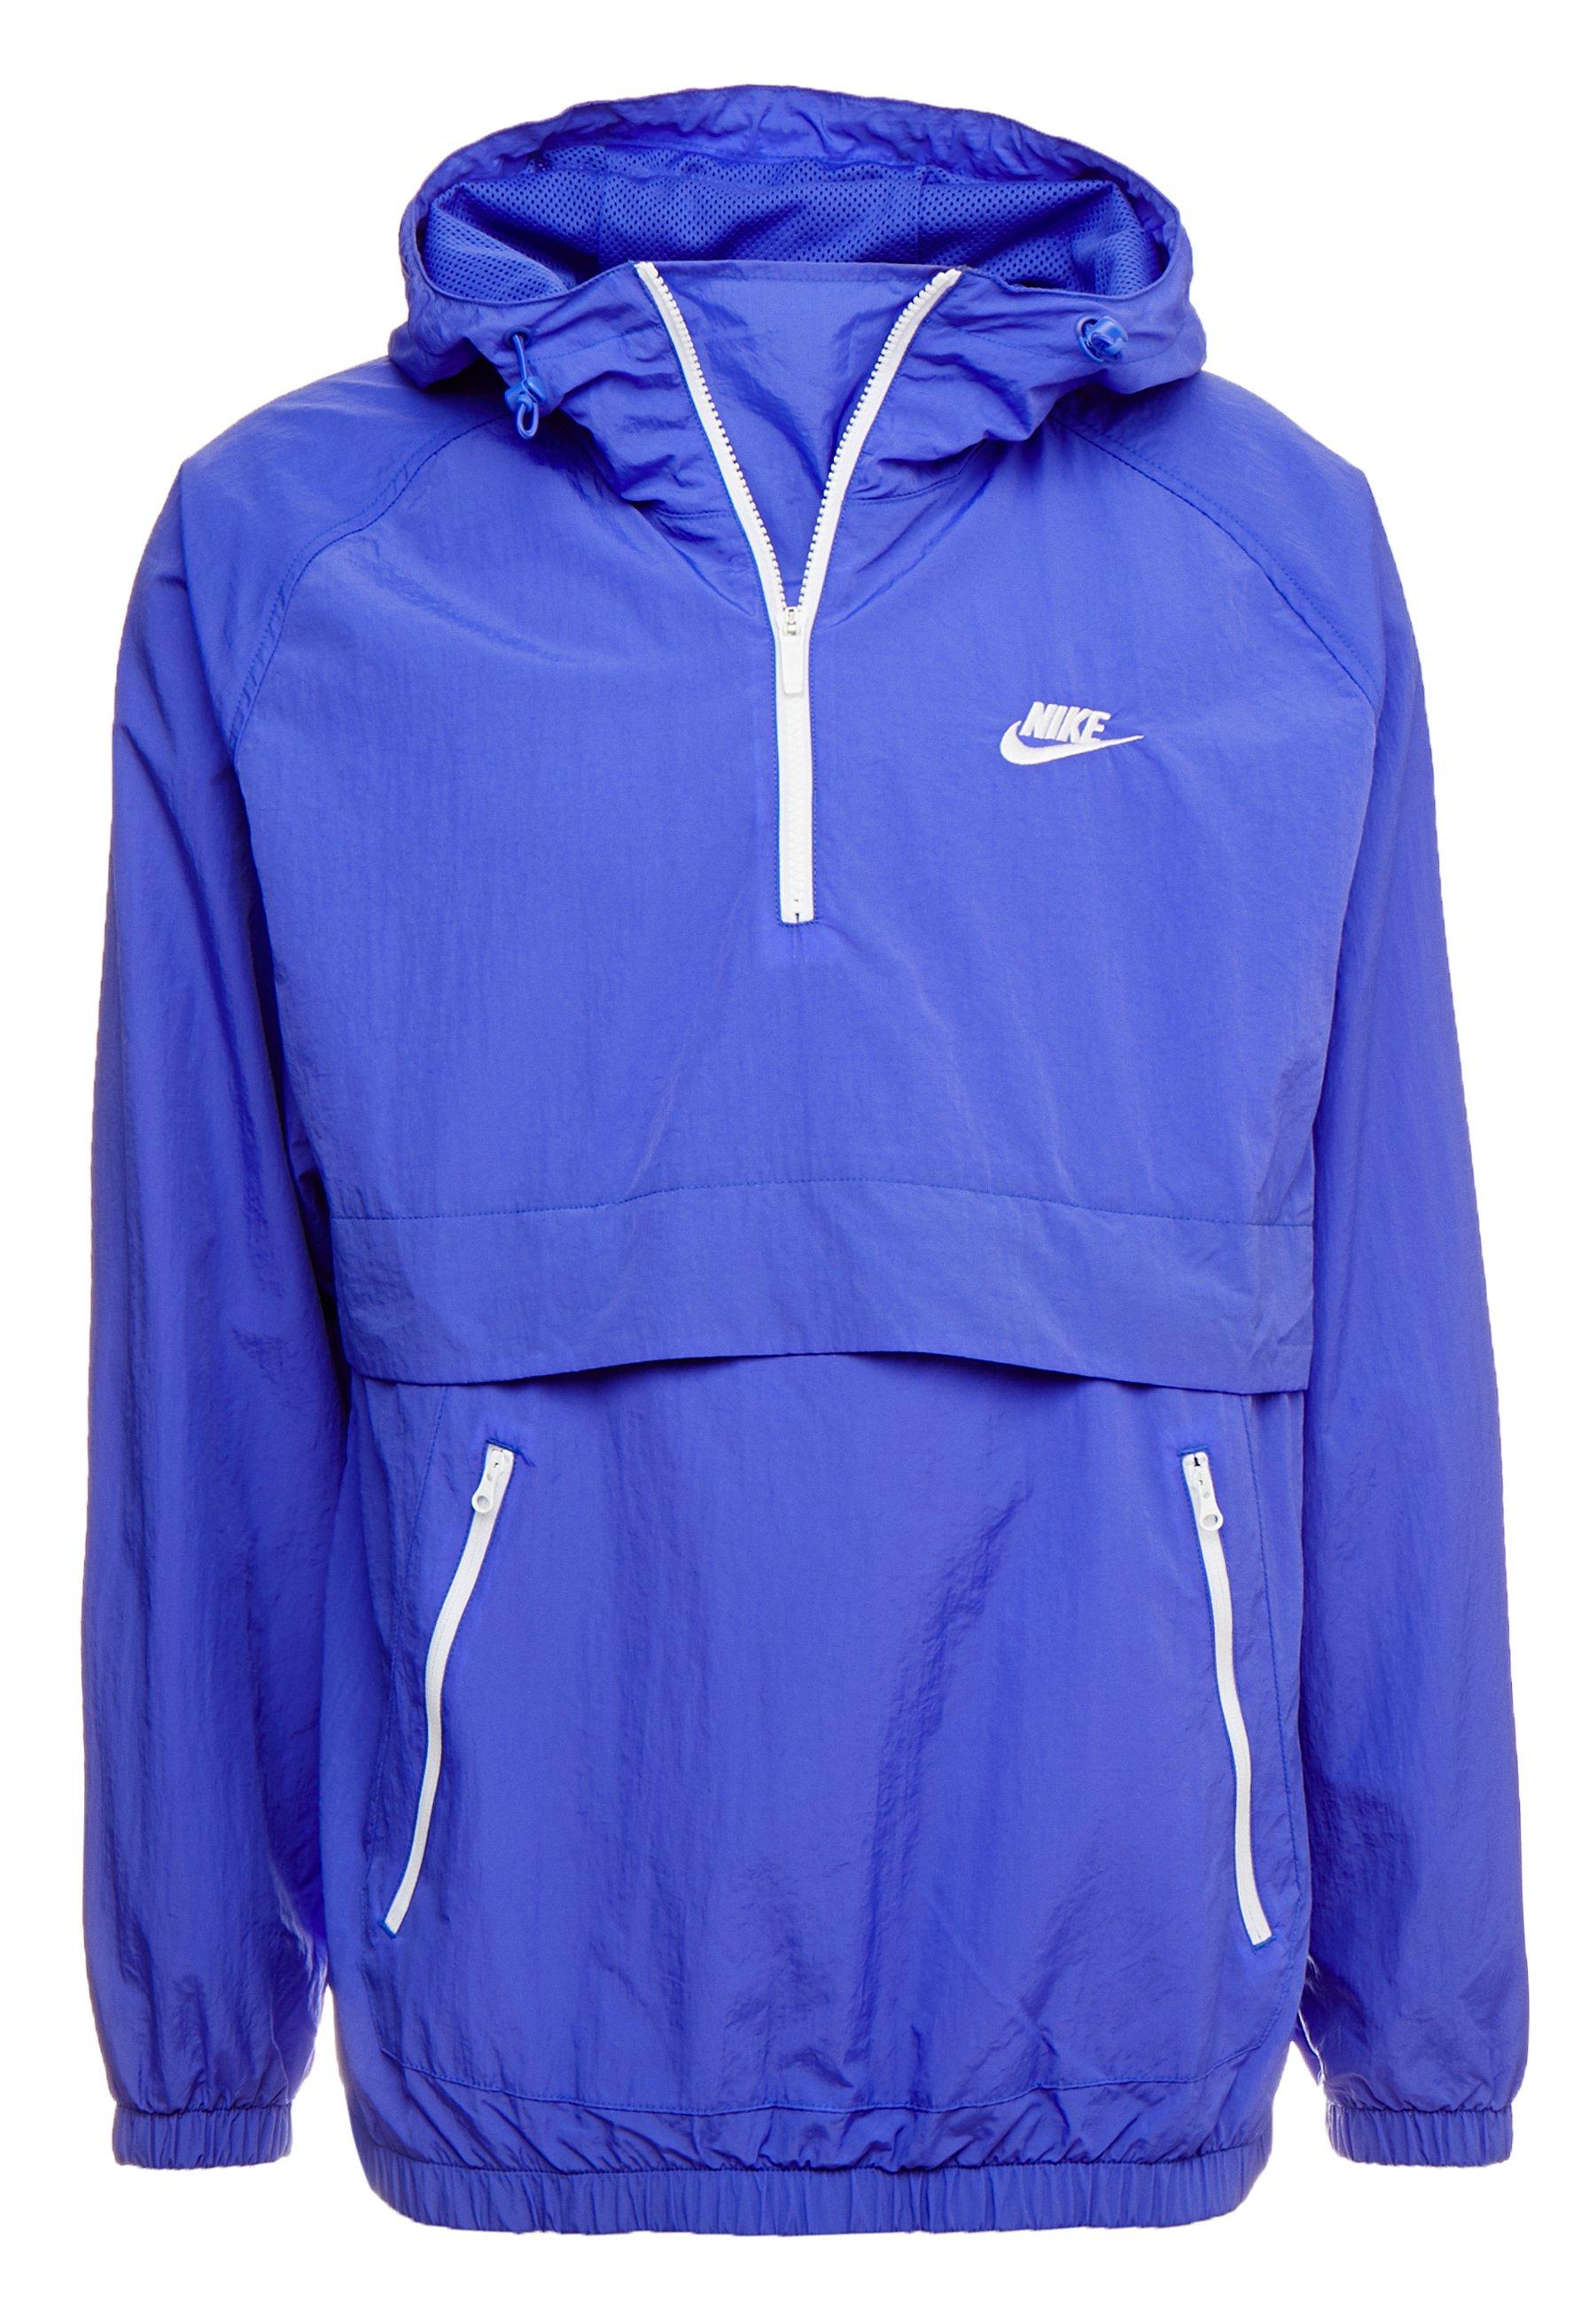 Nike Sportswear Veste coupe-vent - persian violet/white